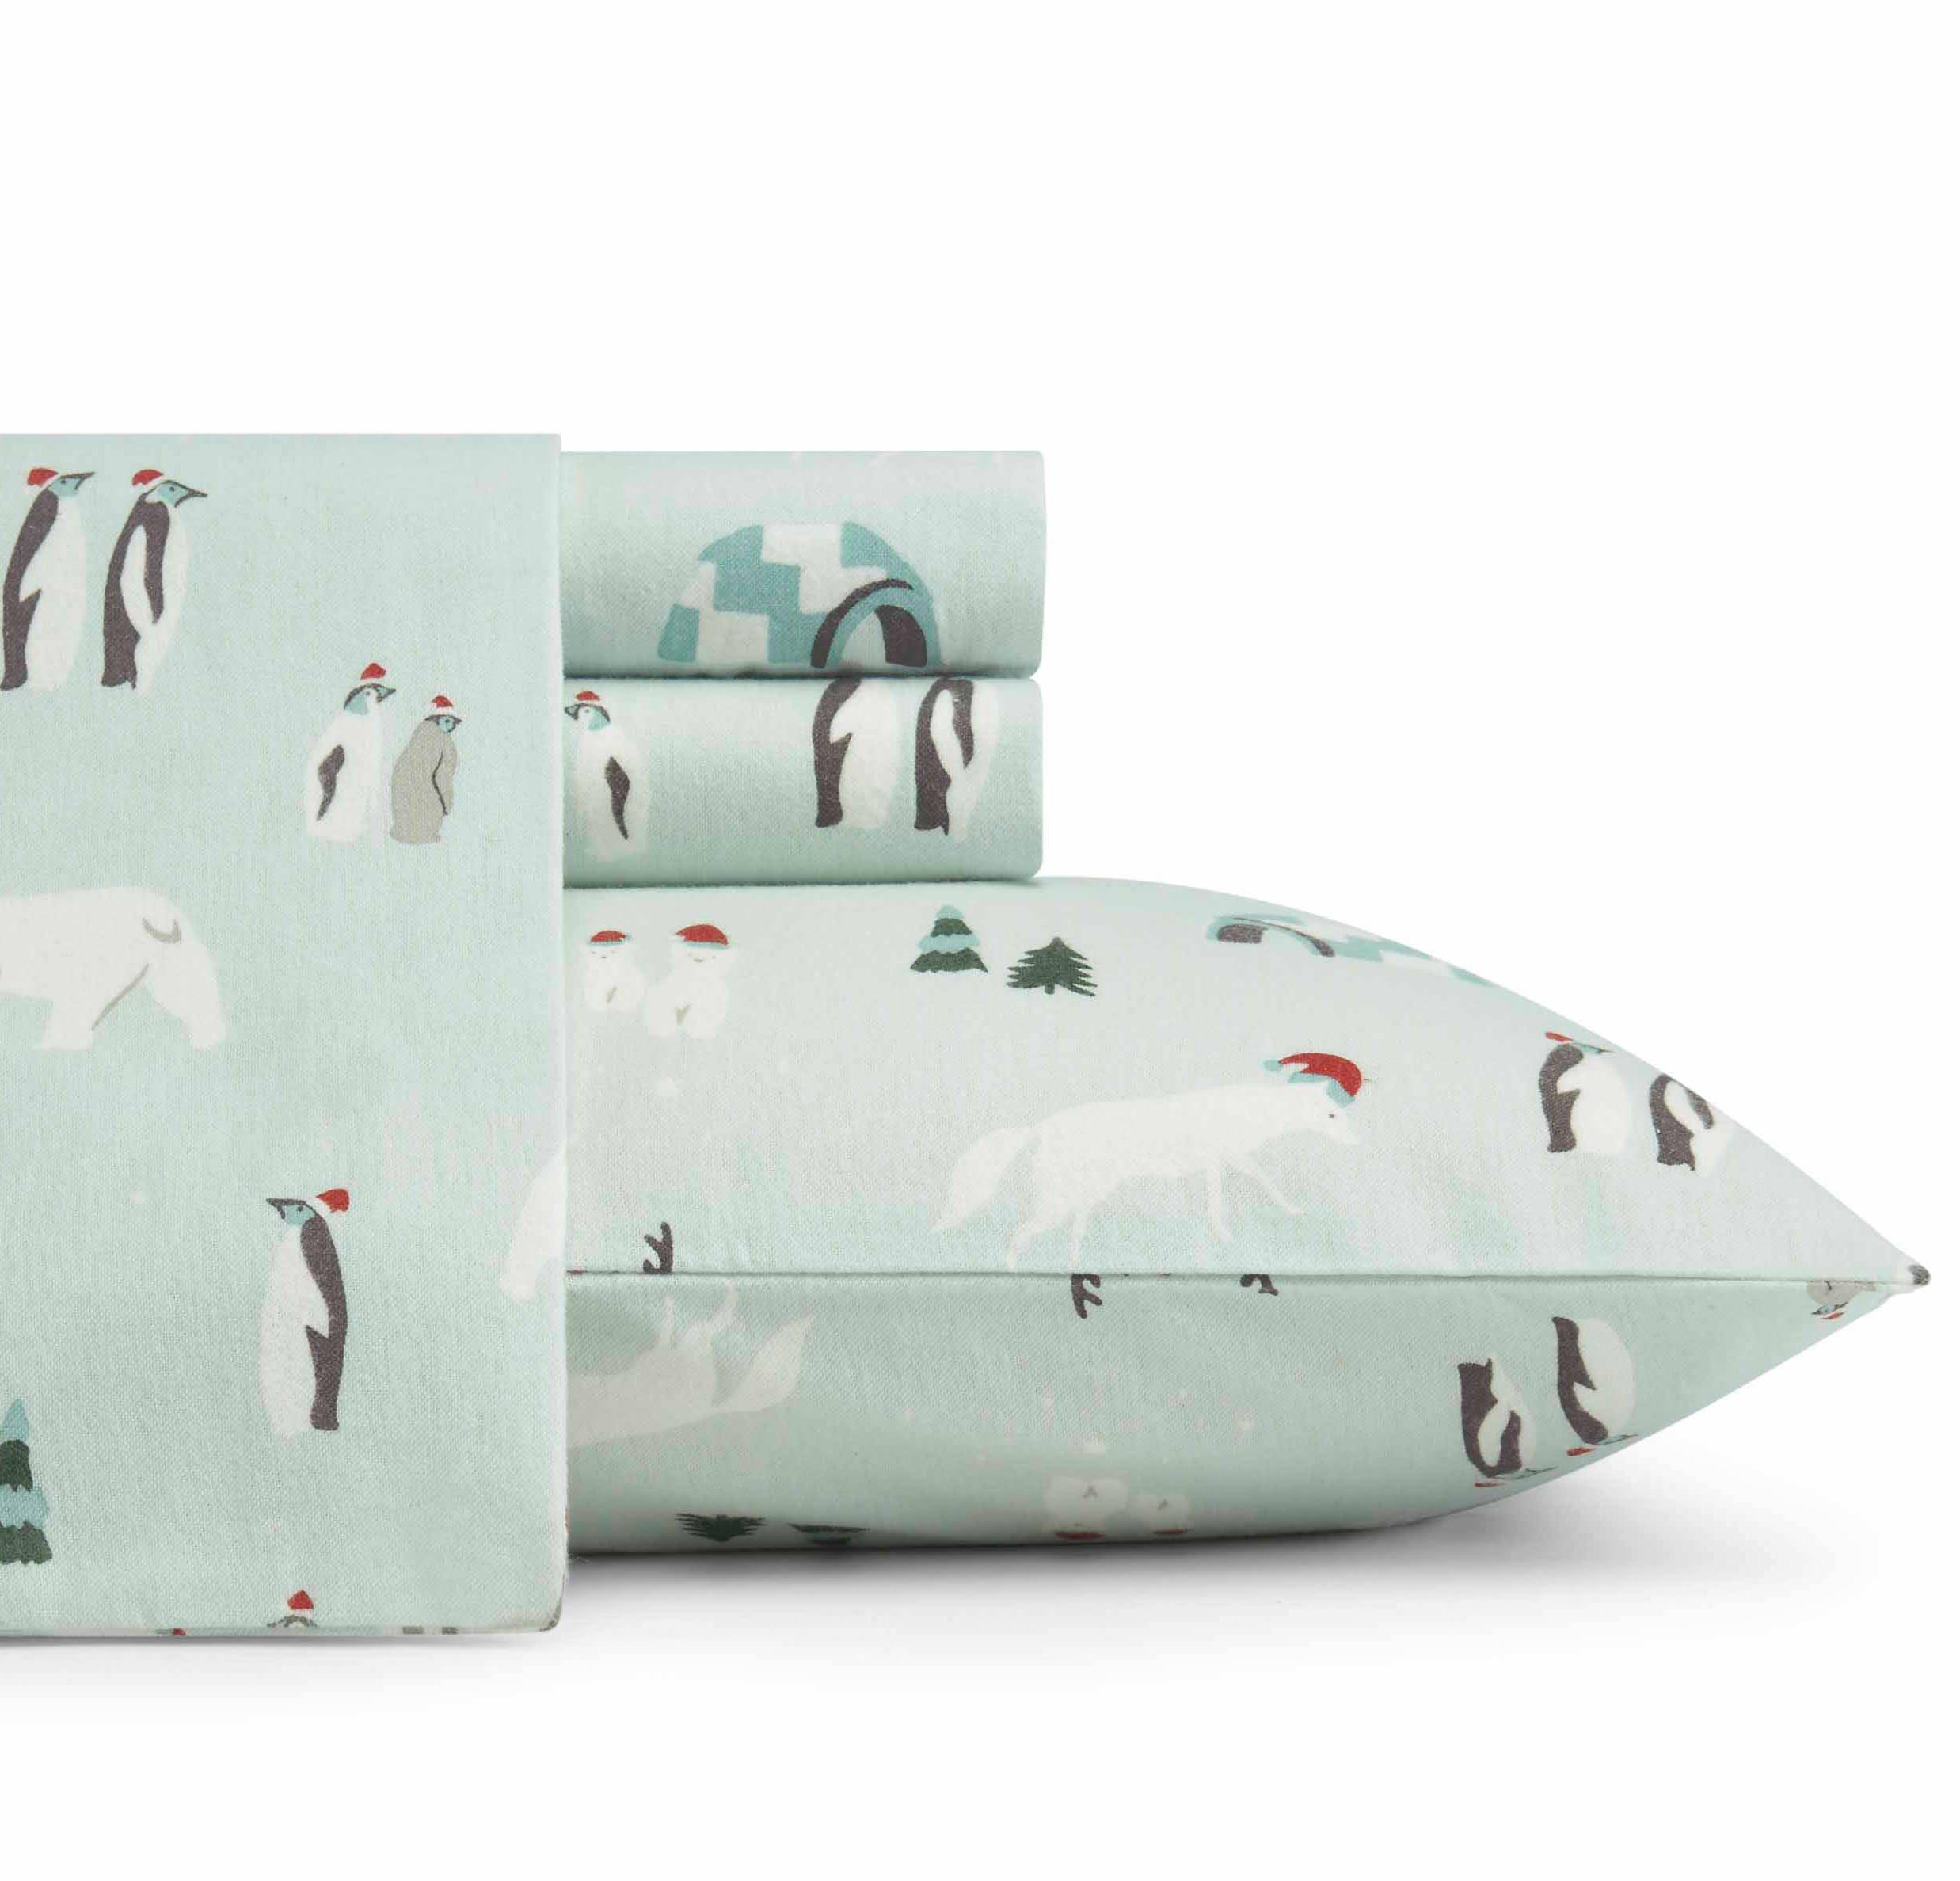 D&A 4 Piece Aqua Blue Snow Animals Theme Sheets Set Full Sized, Beautiful Penguins, Fox, White Bears, Alpine Tree, Igloo Print, Elasticized Fitted, Deep Pocket, Cotton Flannel